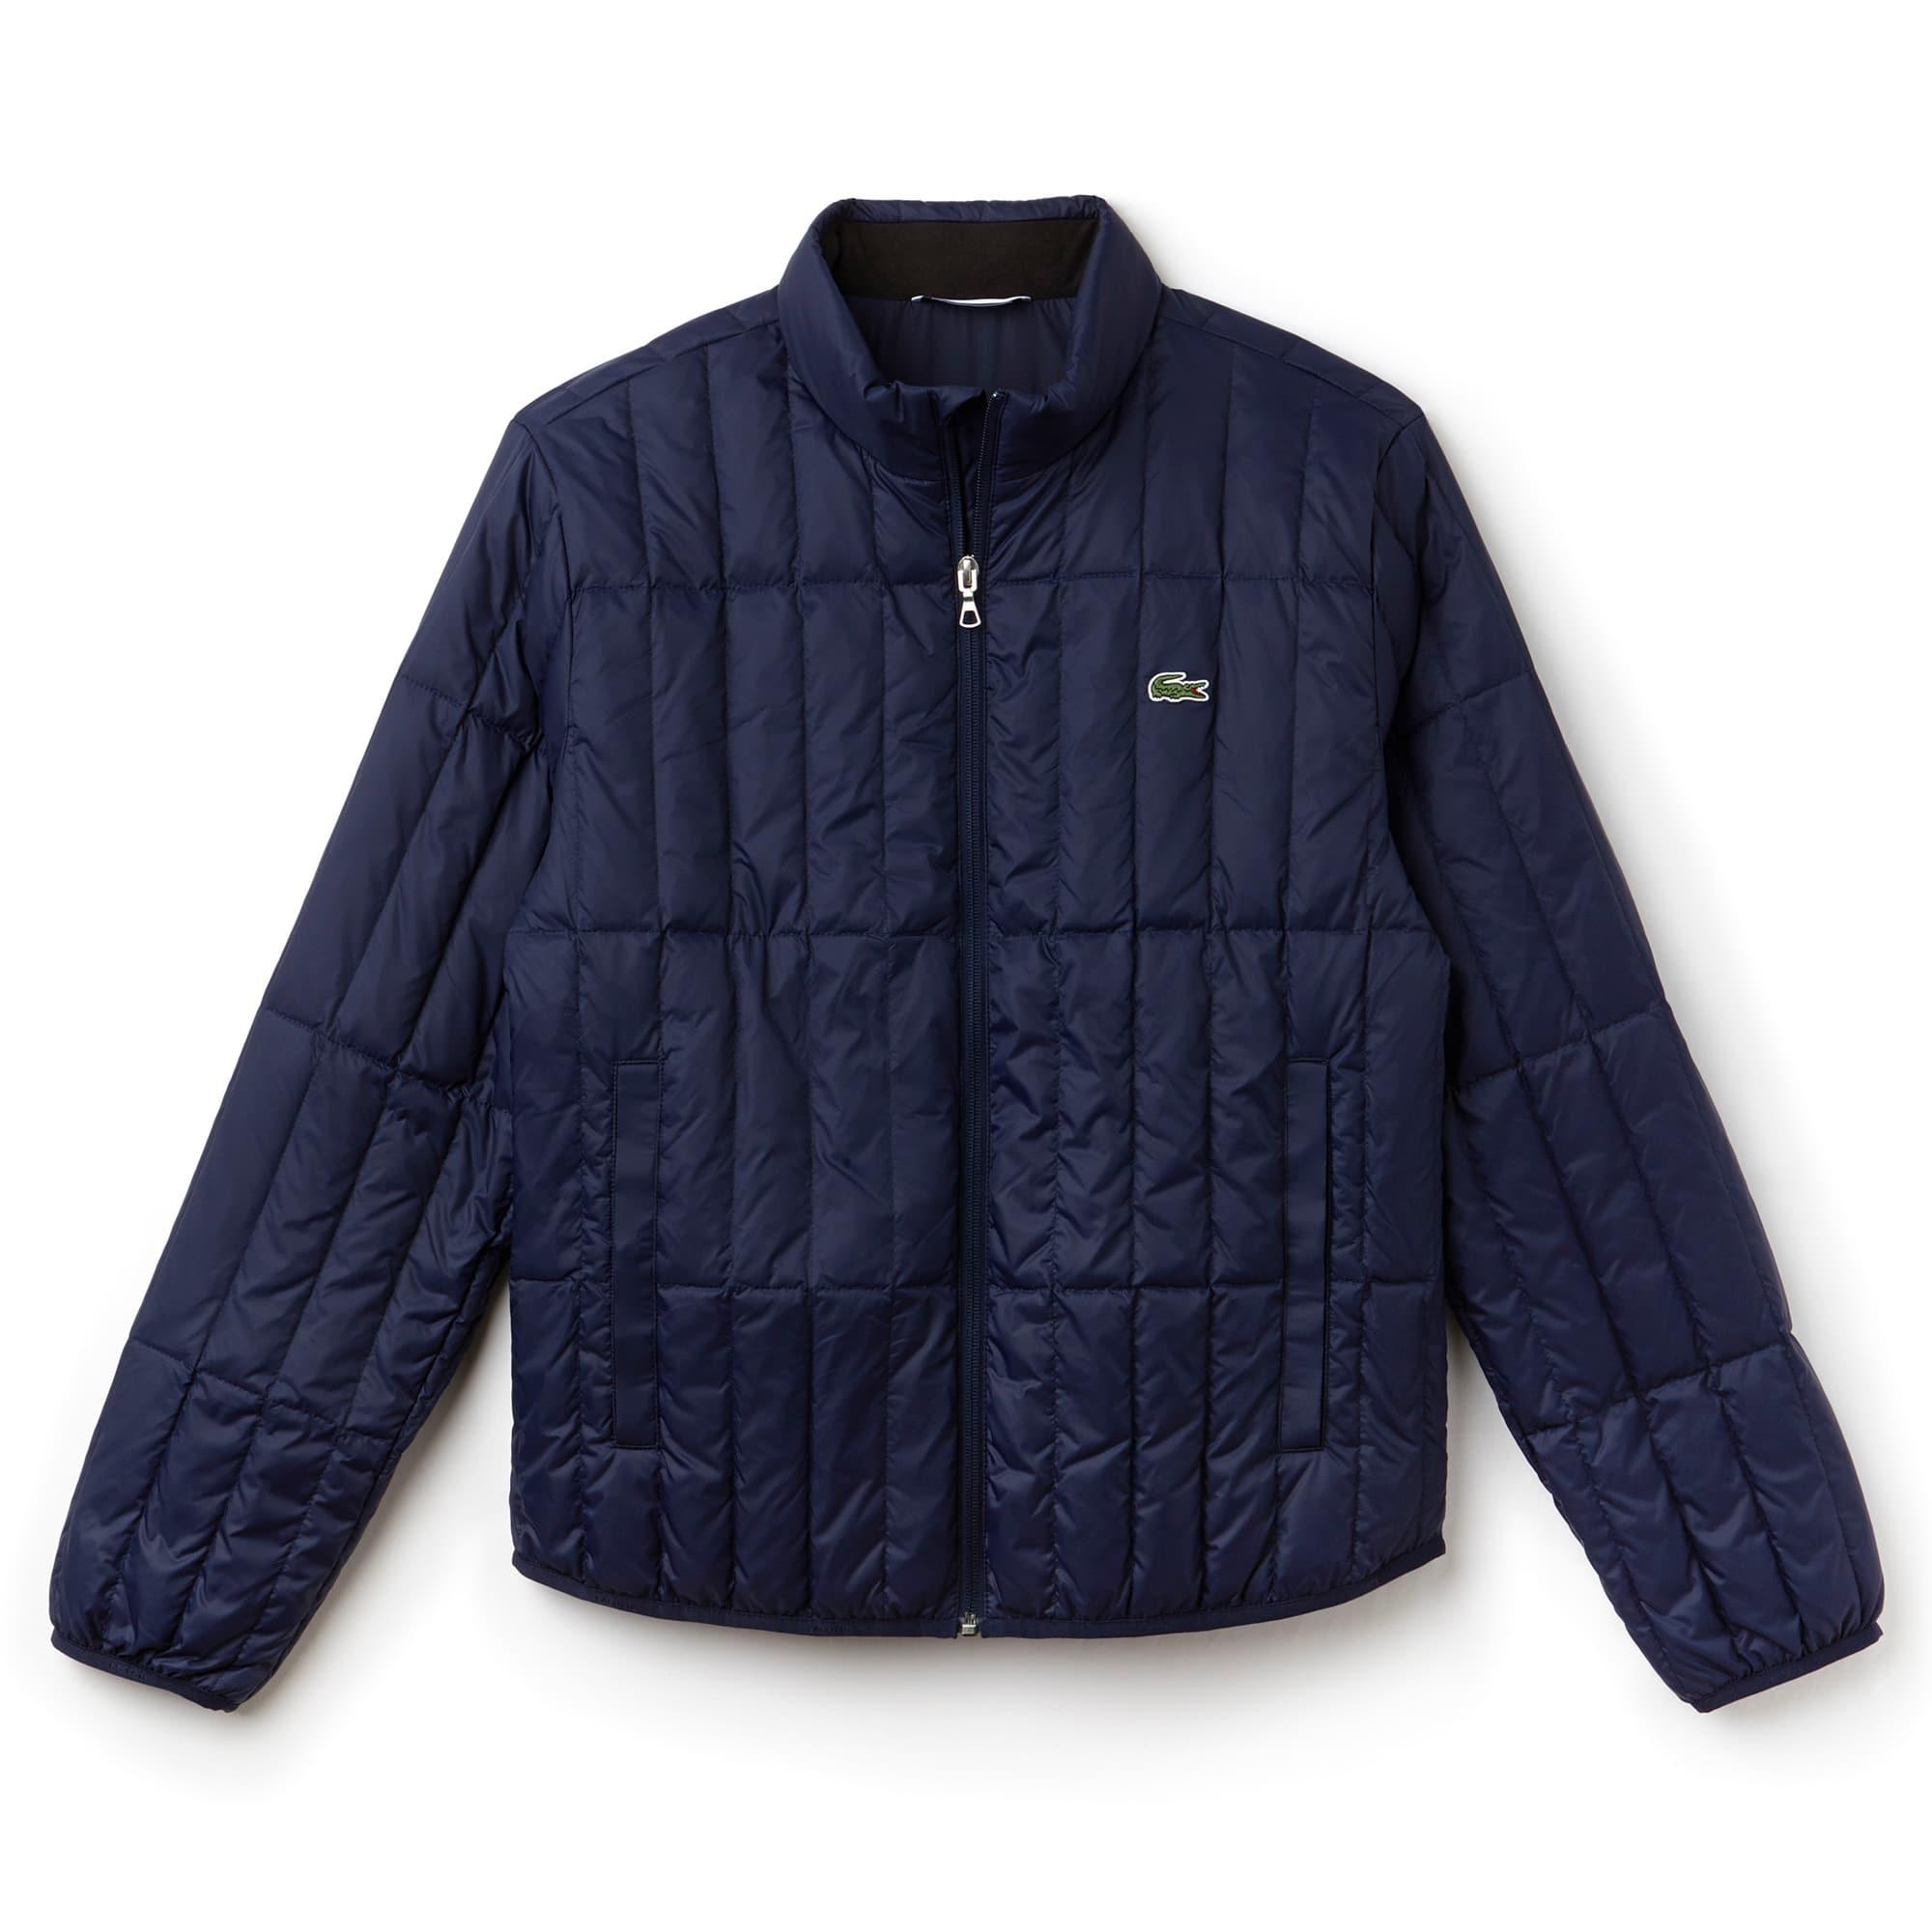 Men's Lightweight Built-in Hood Quilted Down Packable Jacket | LACOSTE : mens lightweight quilted jacket - Adamdwight.com